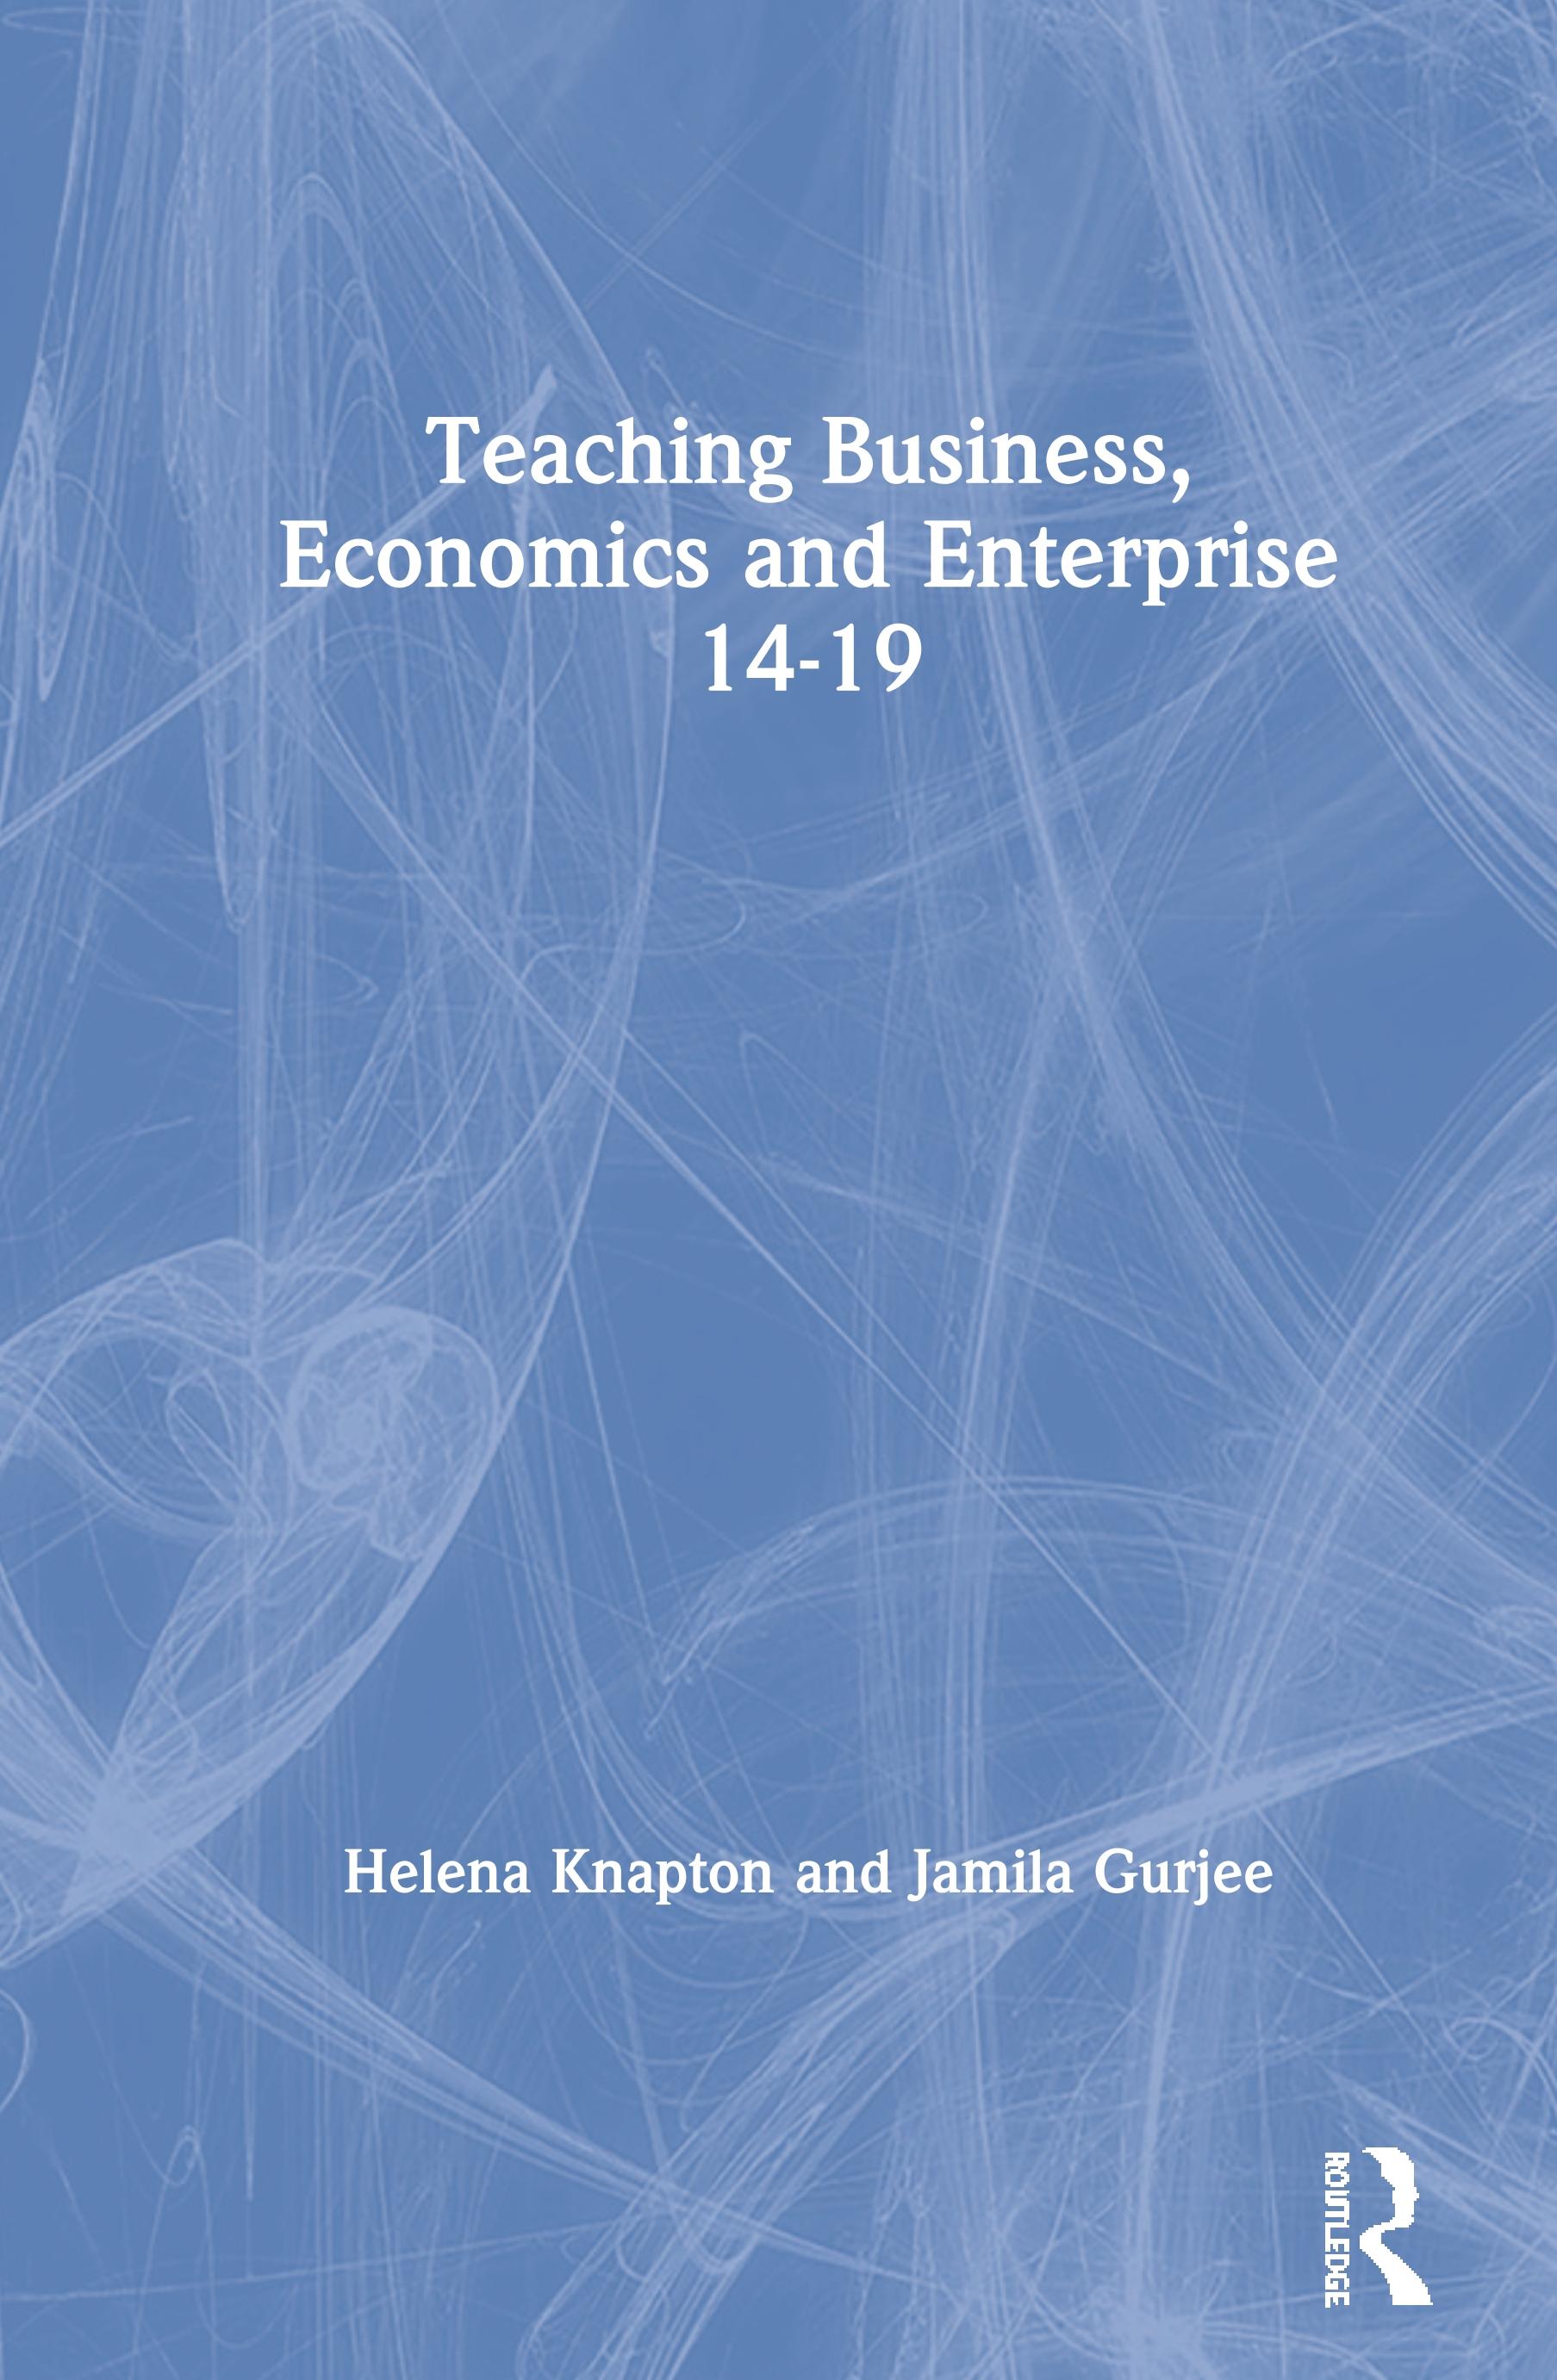 Teaching Business, Economics and Enterprise 14-19: 1st Edition (Hardback) book cover